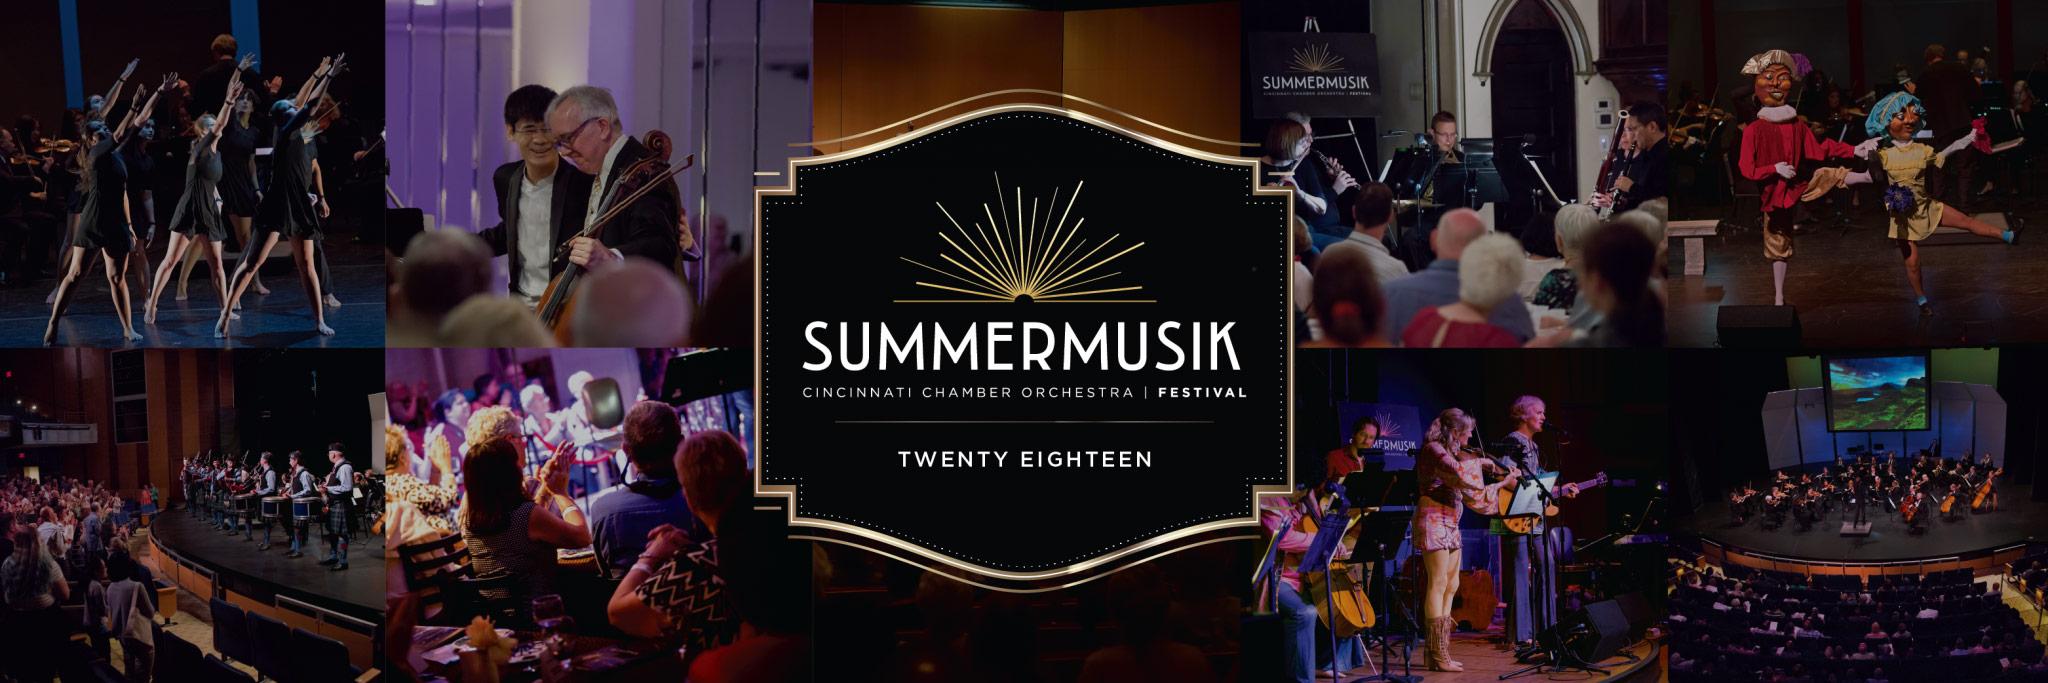 Summermusik 2018